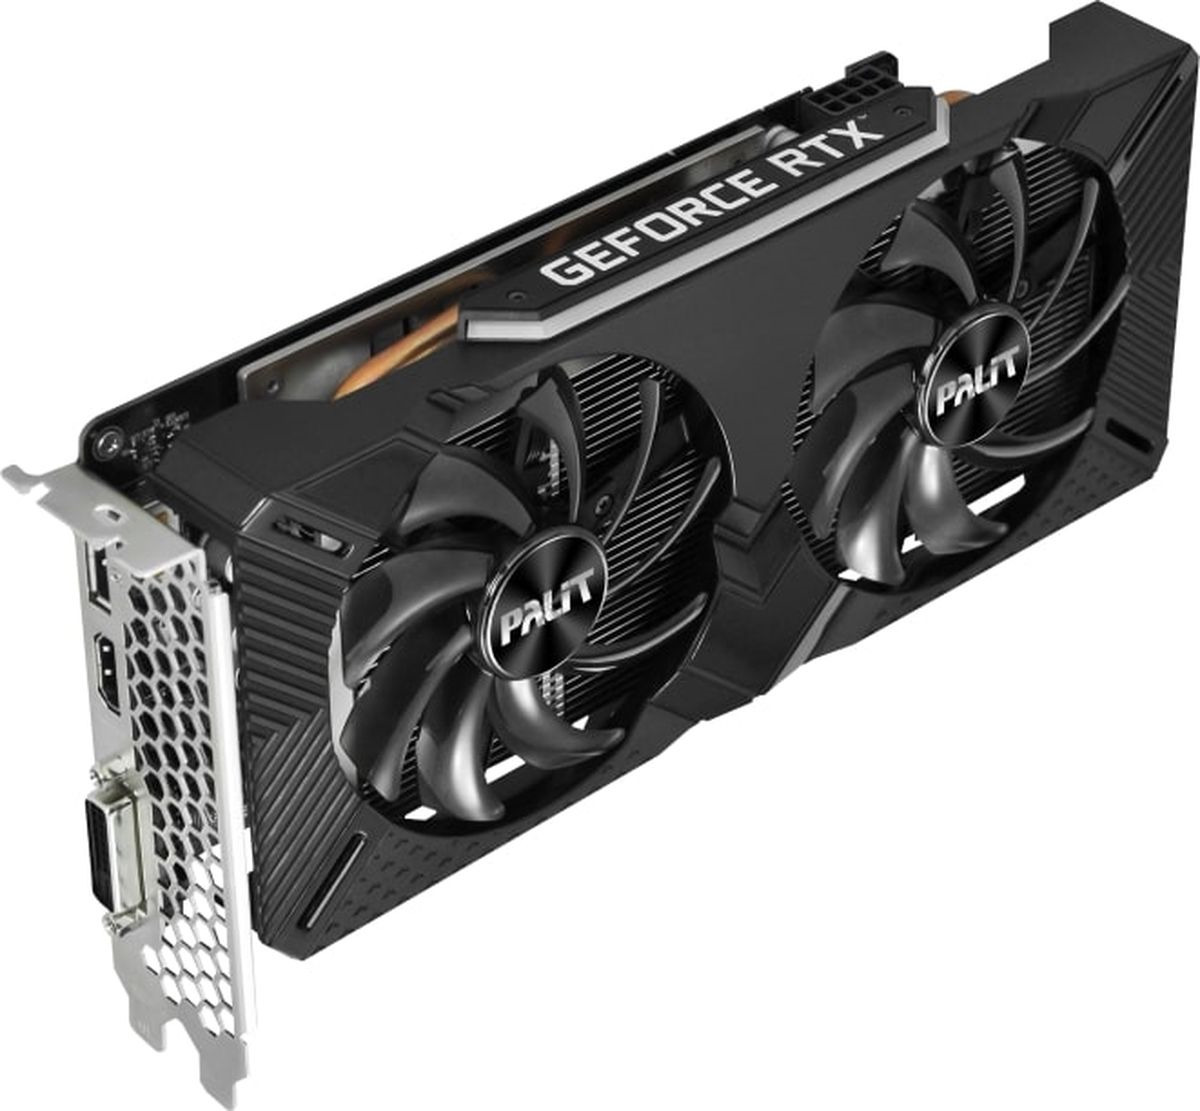 Видеокарта Palit GeForce RTX 2060 Dual OC 6GB, NE62060S18J9-1160A видеокарта palit pa gtx1060 dual 3g